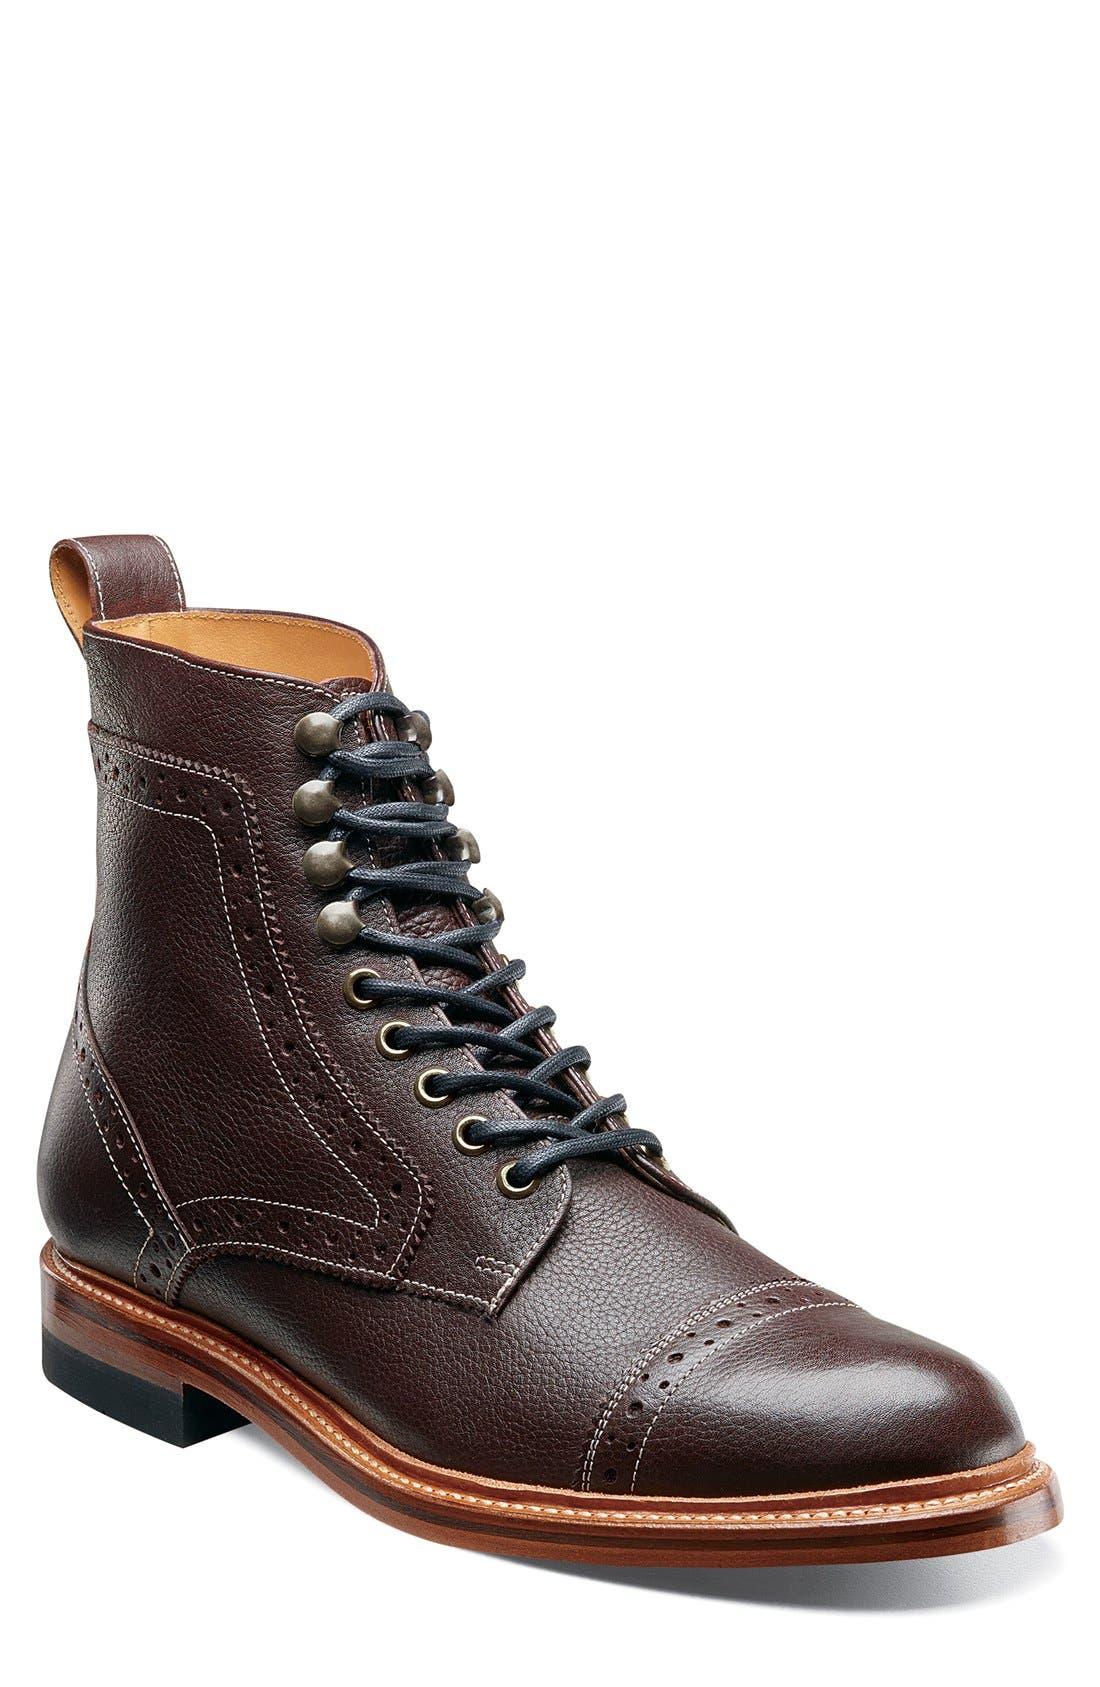 Madison II Cap Toe Boot,                             Main thumbnail 1, color,                             930